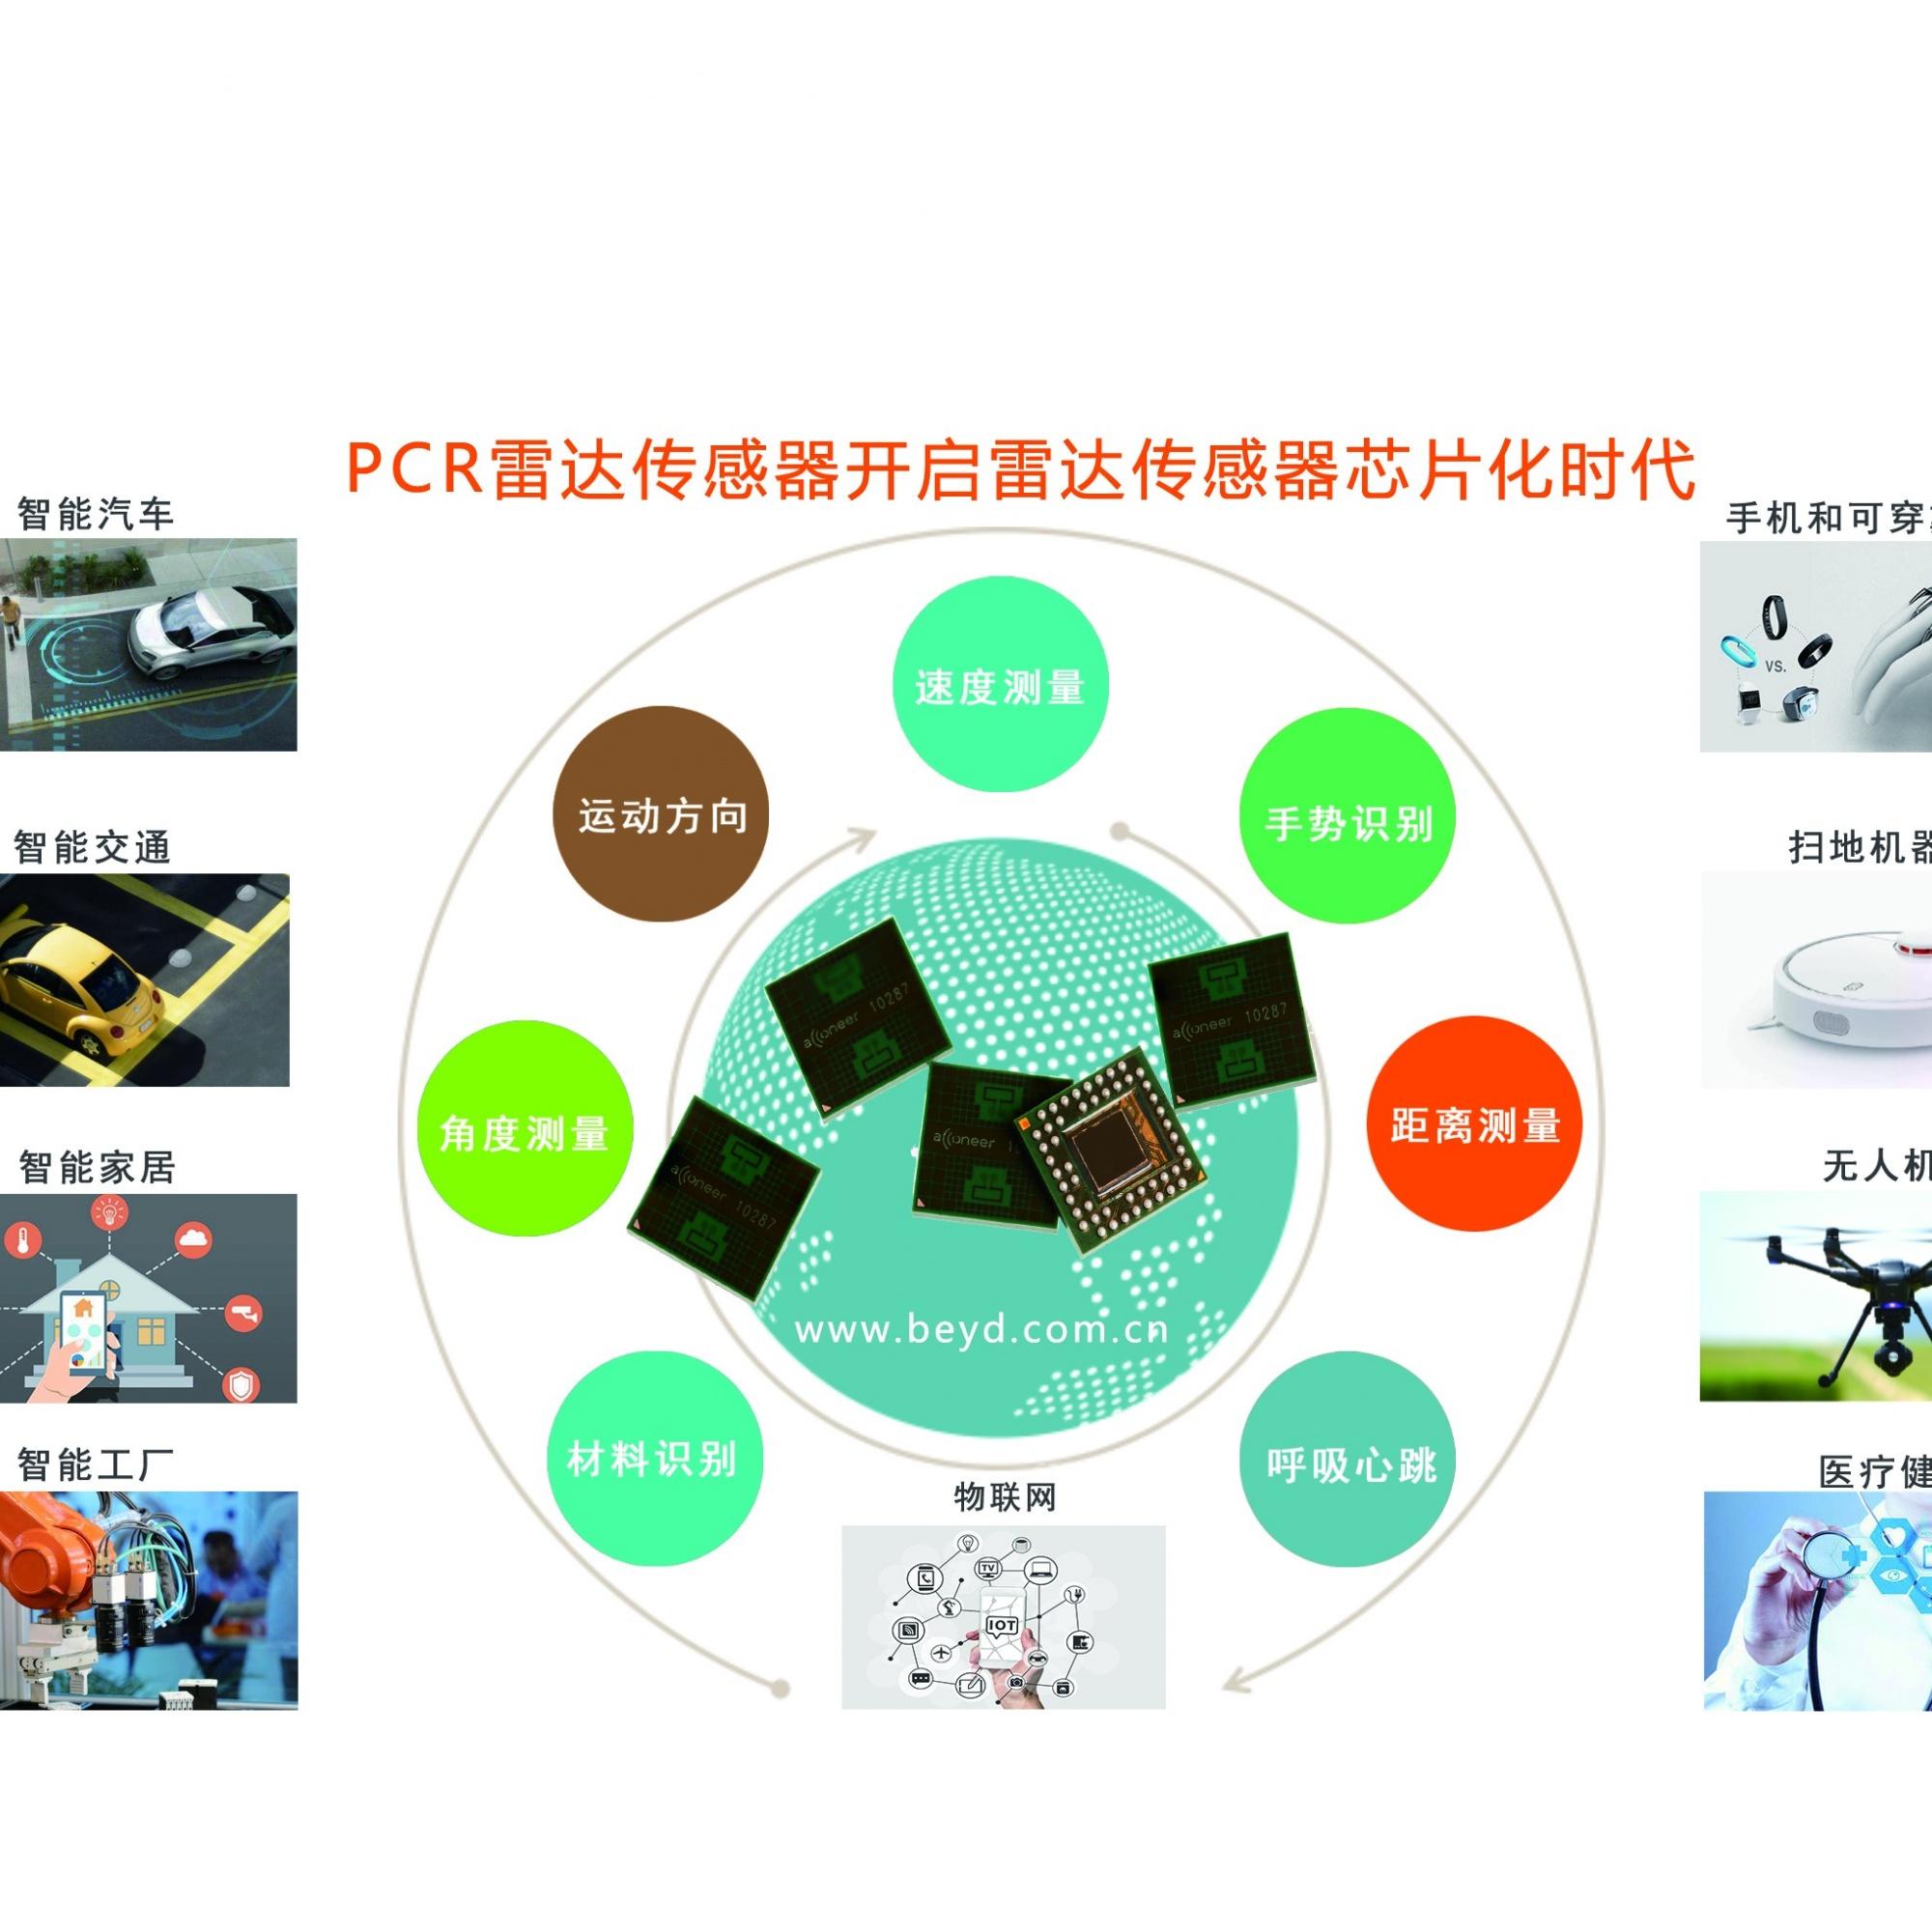 Acconeer  60GHZ PCR雷达传感器资料(测距、材料识别、呼吸心跳)